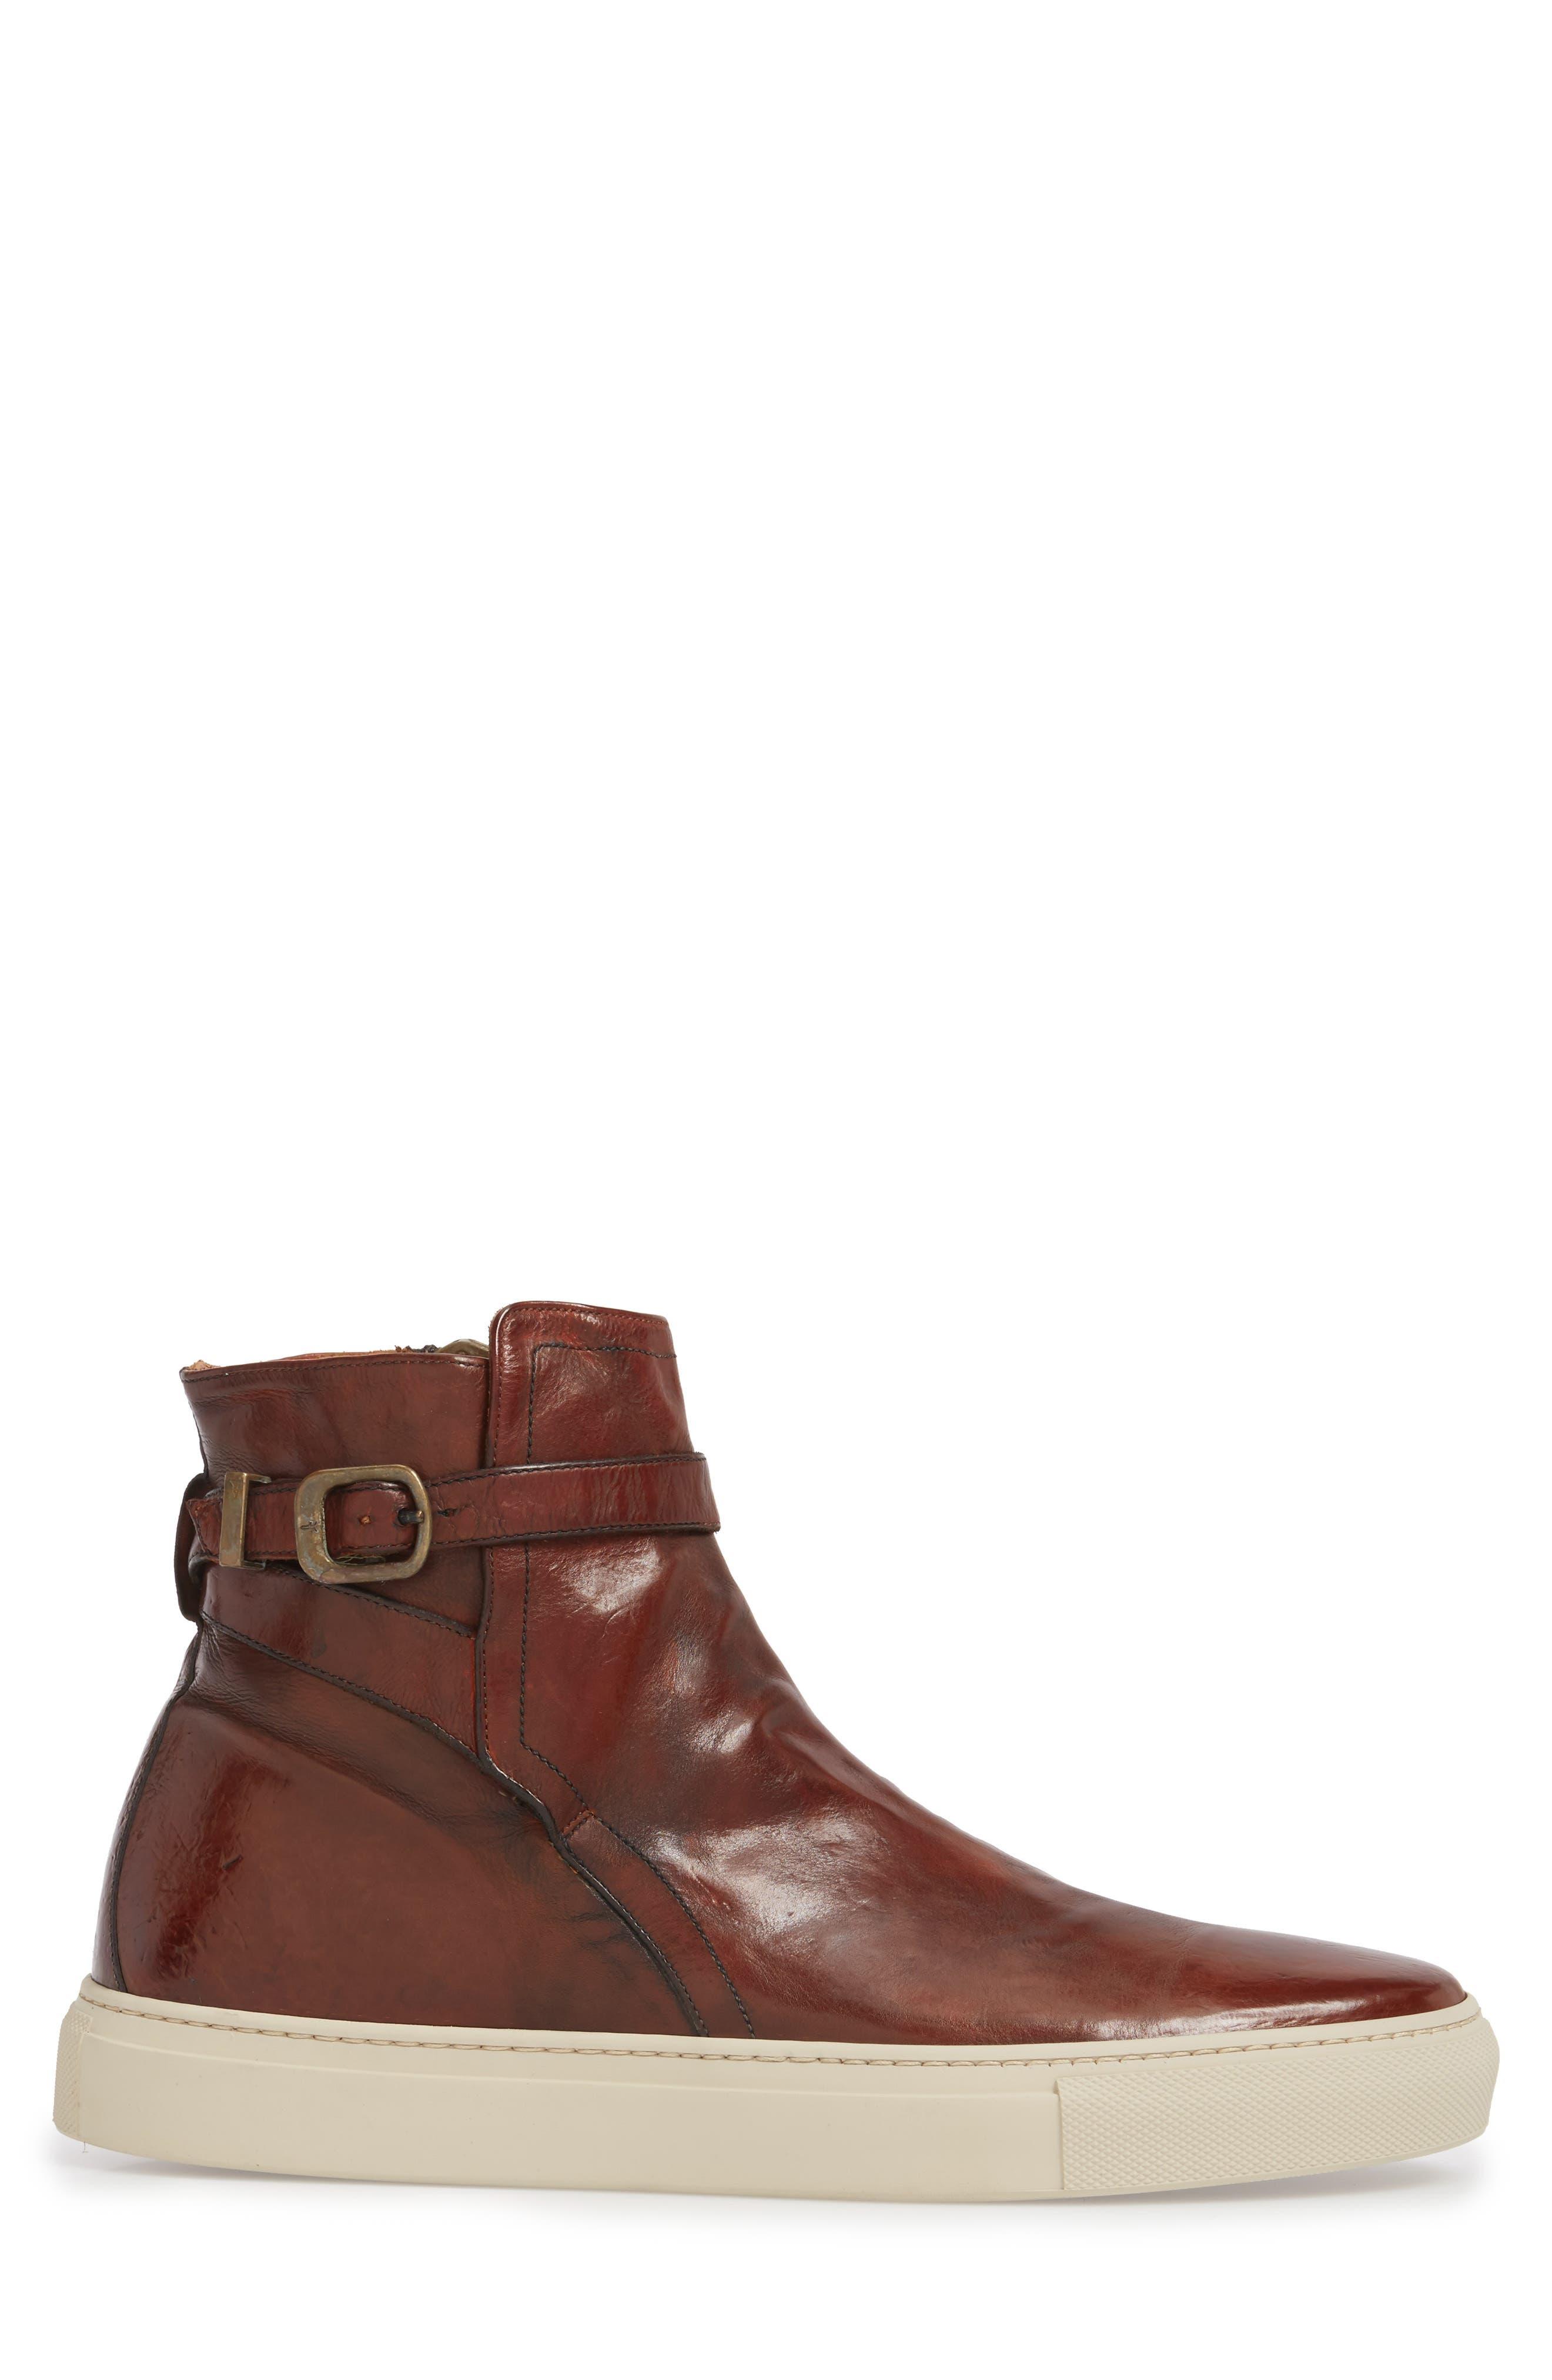 Owen Jodhpur High Top Sneaker,                             Alternate thumbnail 3, color,                             Redwood Leather